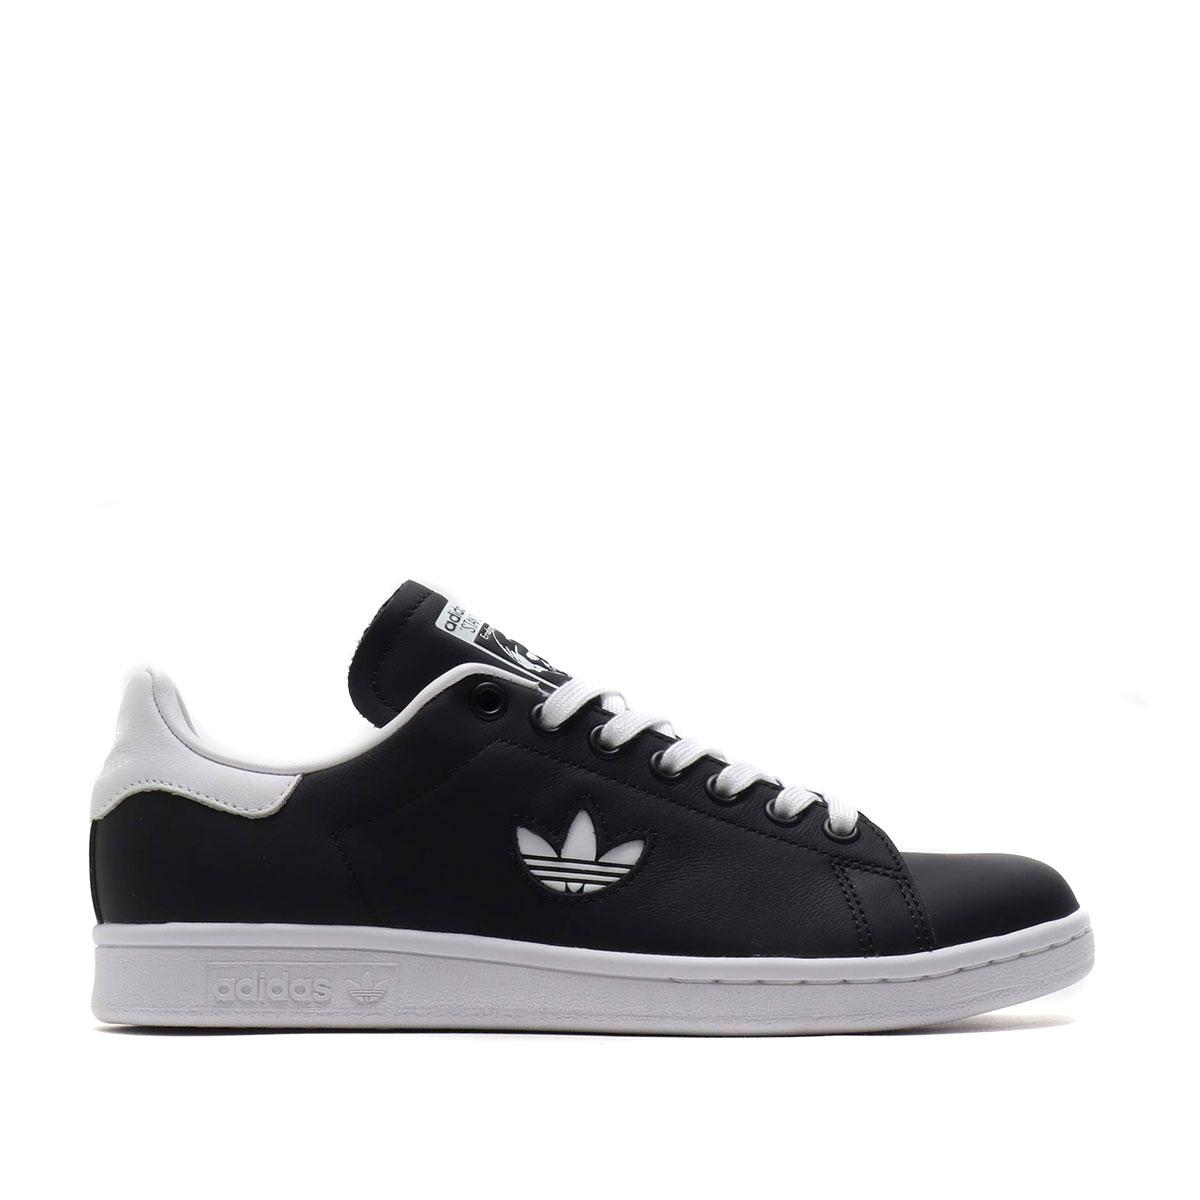 adidas Originals STAN SMITH(CORE BLACK/FTWR WHITE/CORE BLACK)(アディダスオリジナルス スタンスミス)【レディース】【スニーカー】【19SS-I】